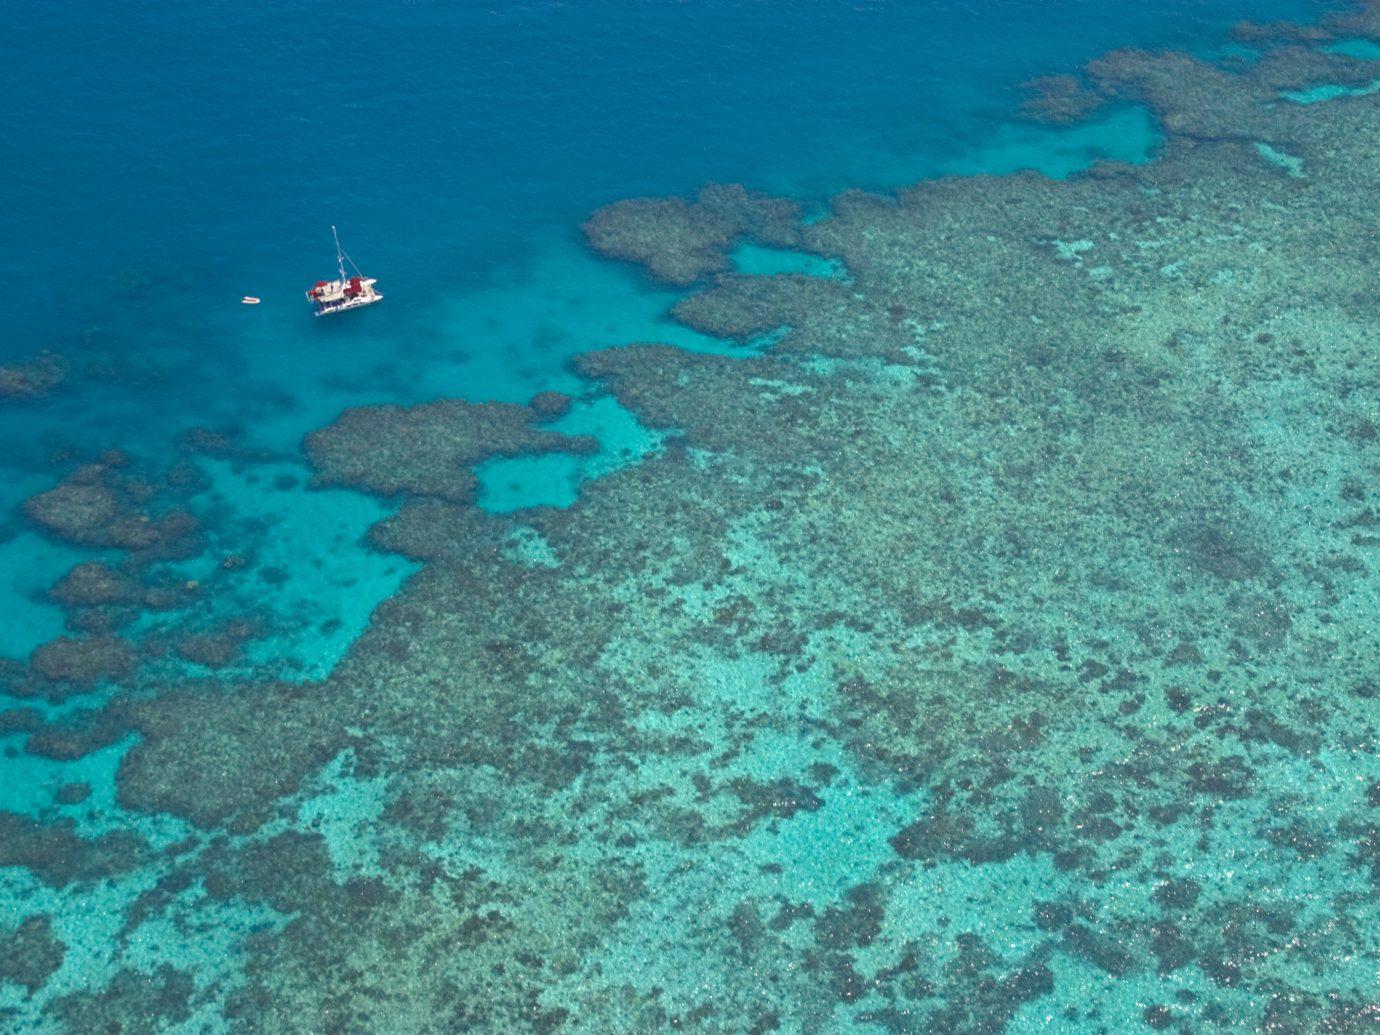 Trip Ideas reef habitat coral reef landform marine biology geographical feature Sea underwater Ocean biology coral diving water sport coral reef fish Island ocean floor